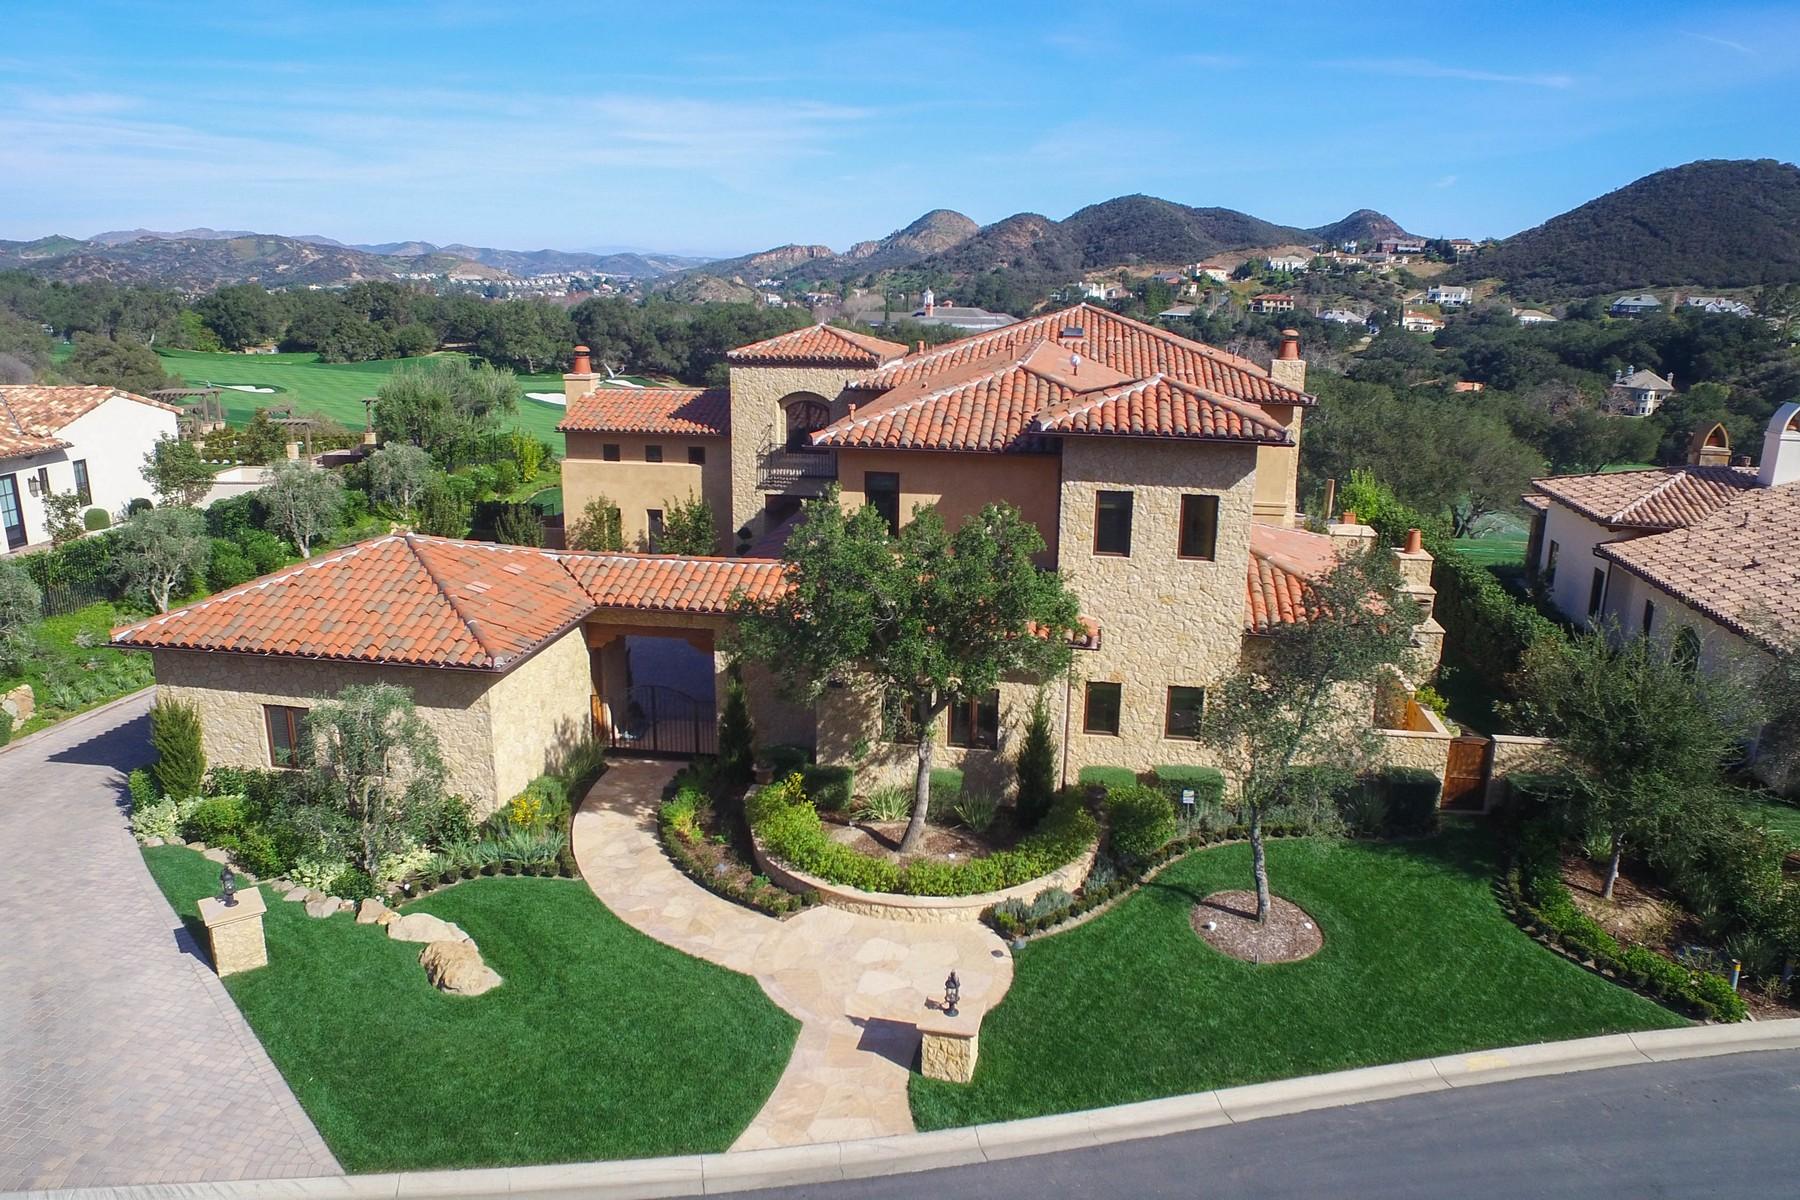 Single Family Home for Sale at Ladbrook Way 2550 Ladbrook Way Thousand Oaks, California, 91361 United States